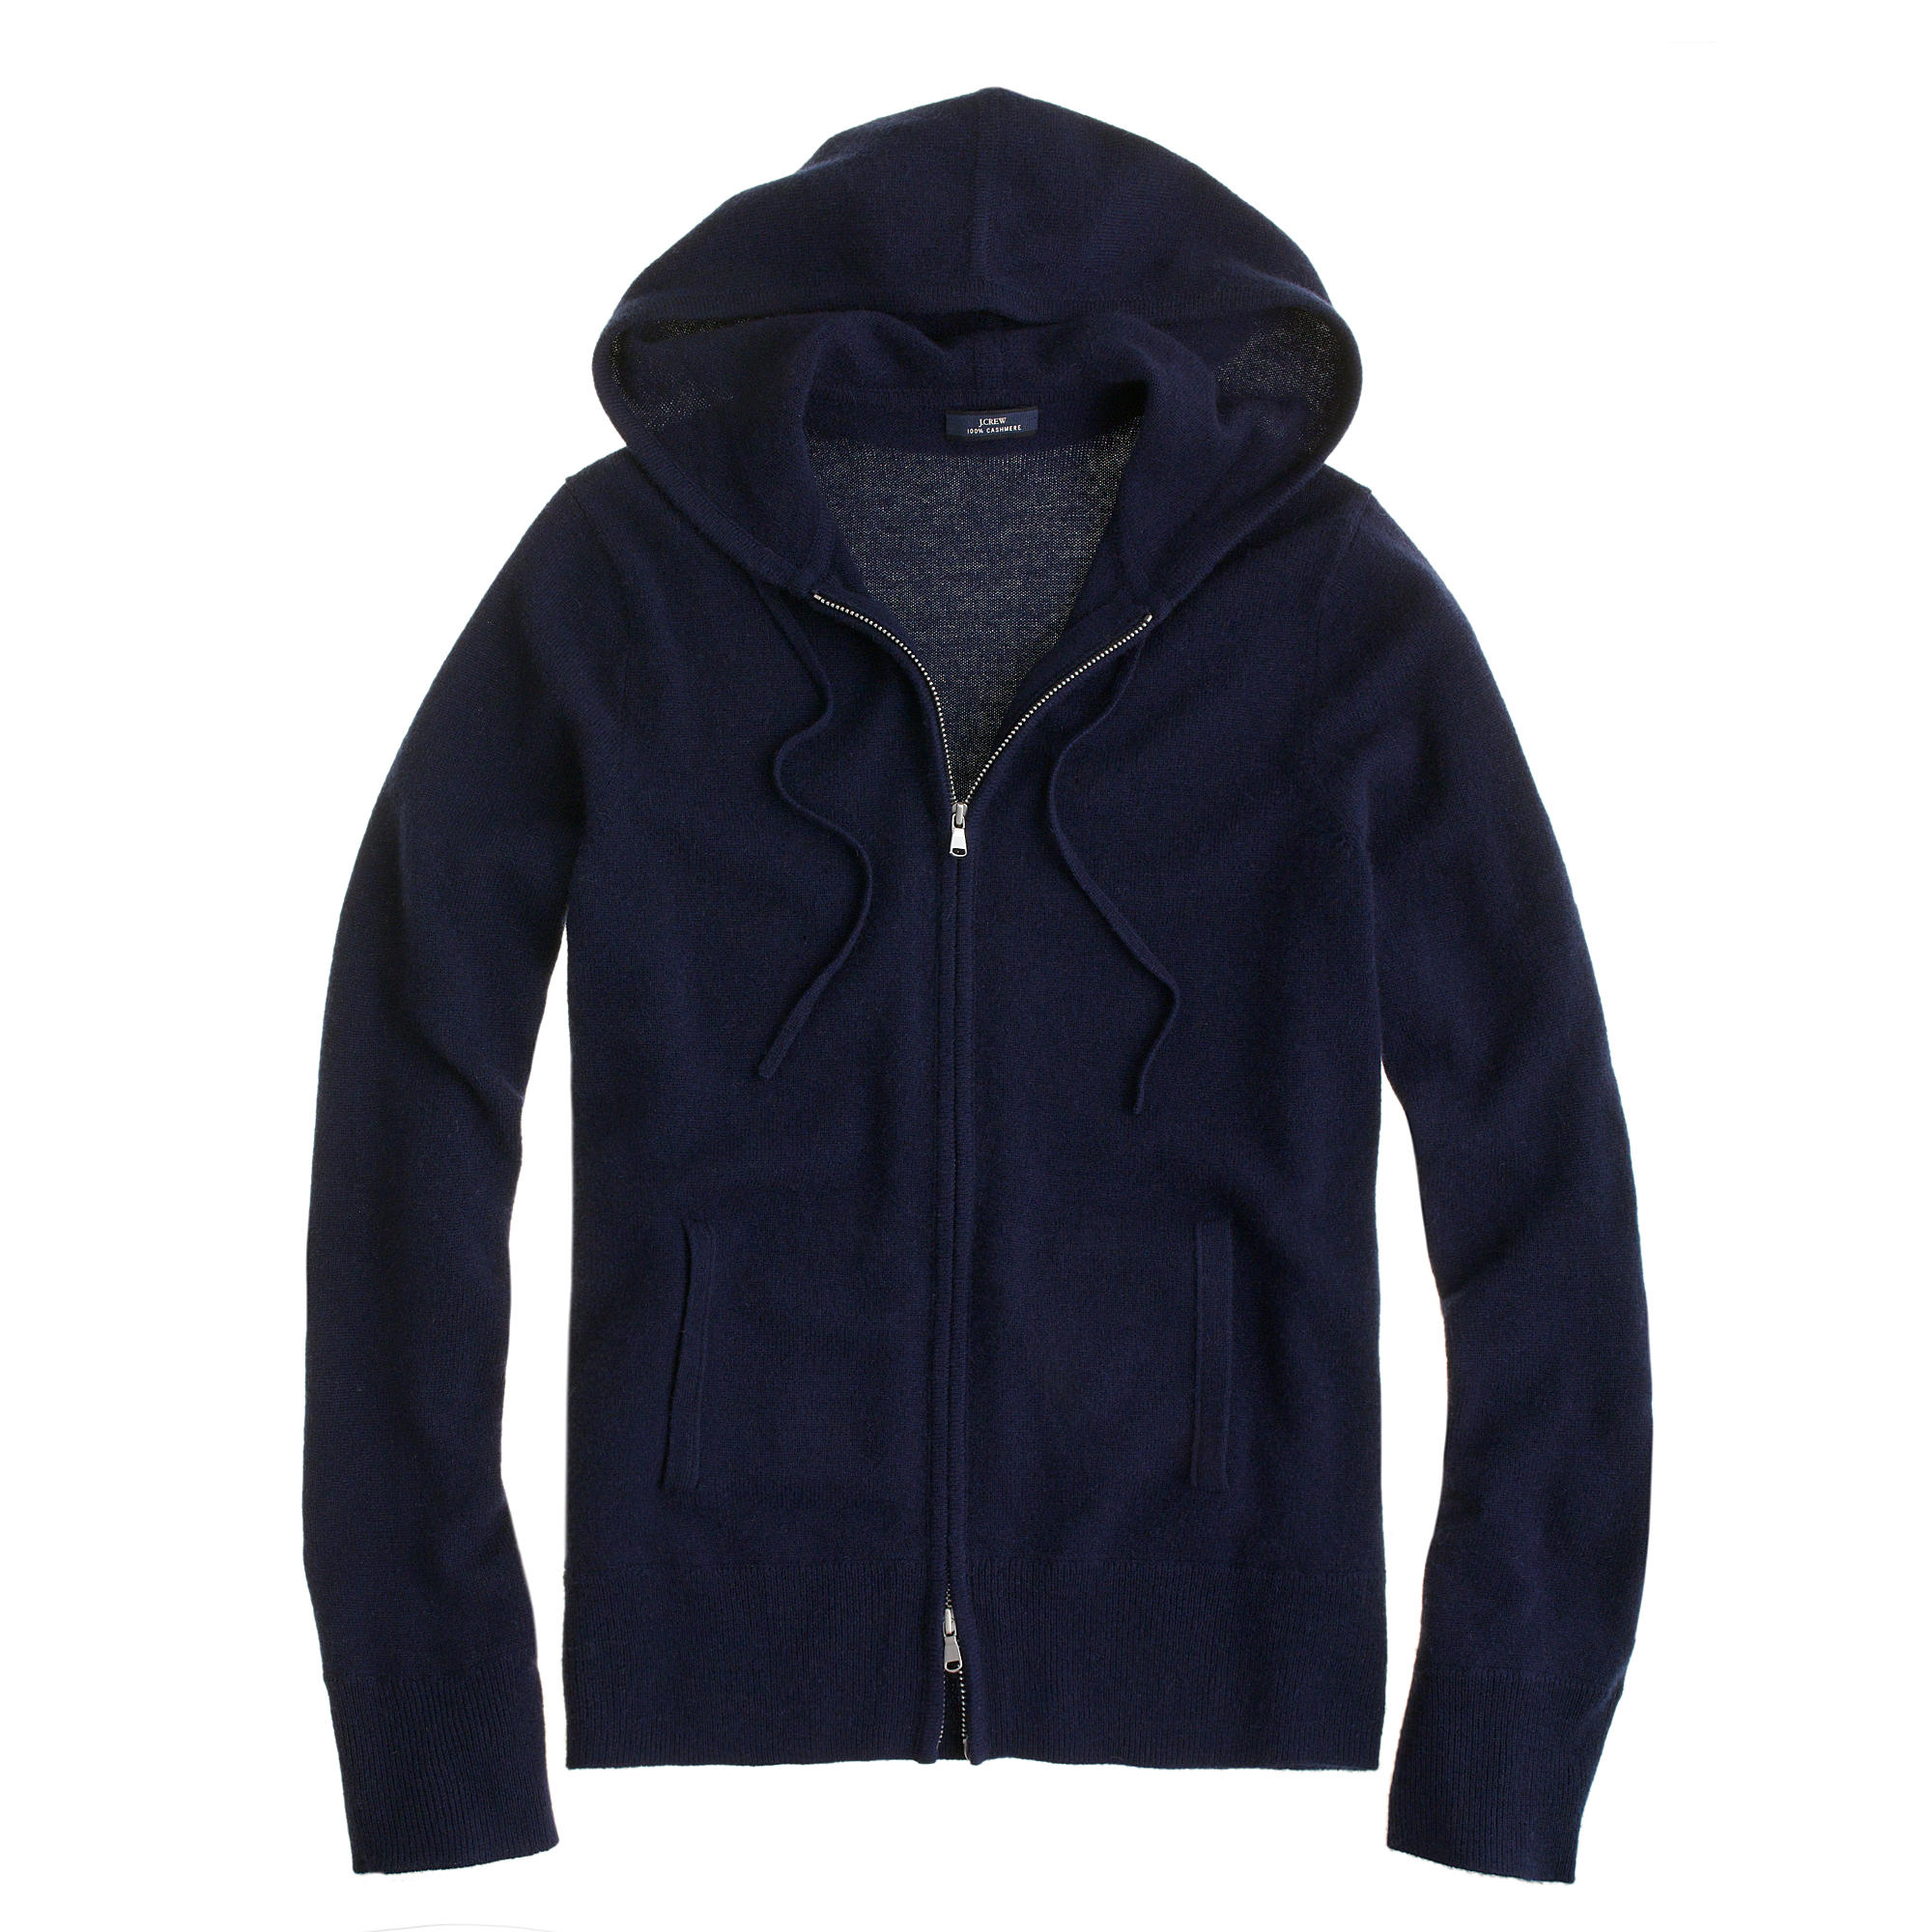 Italian hoodies